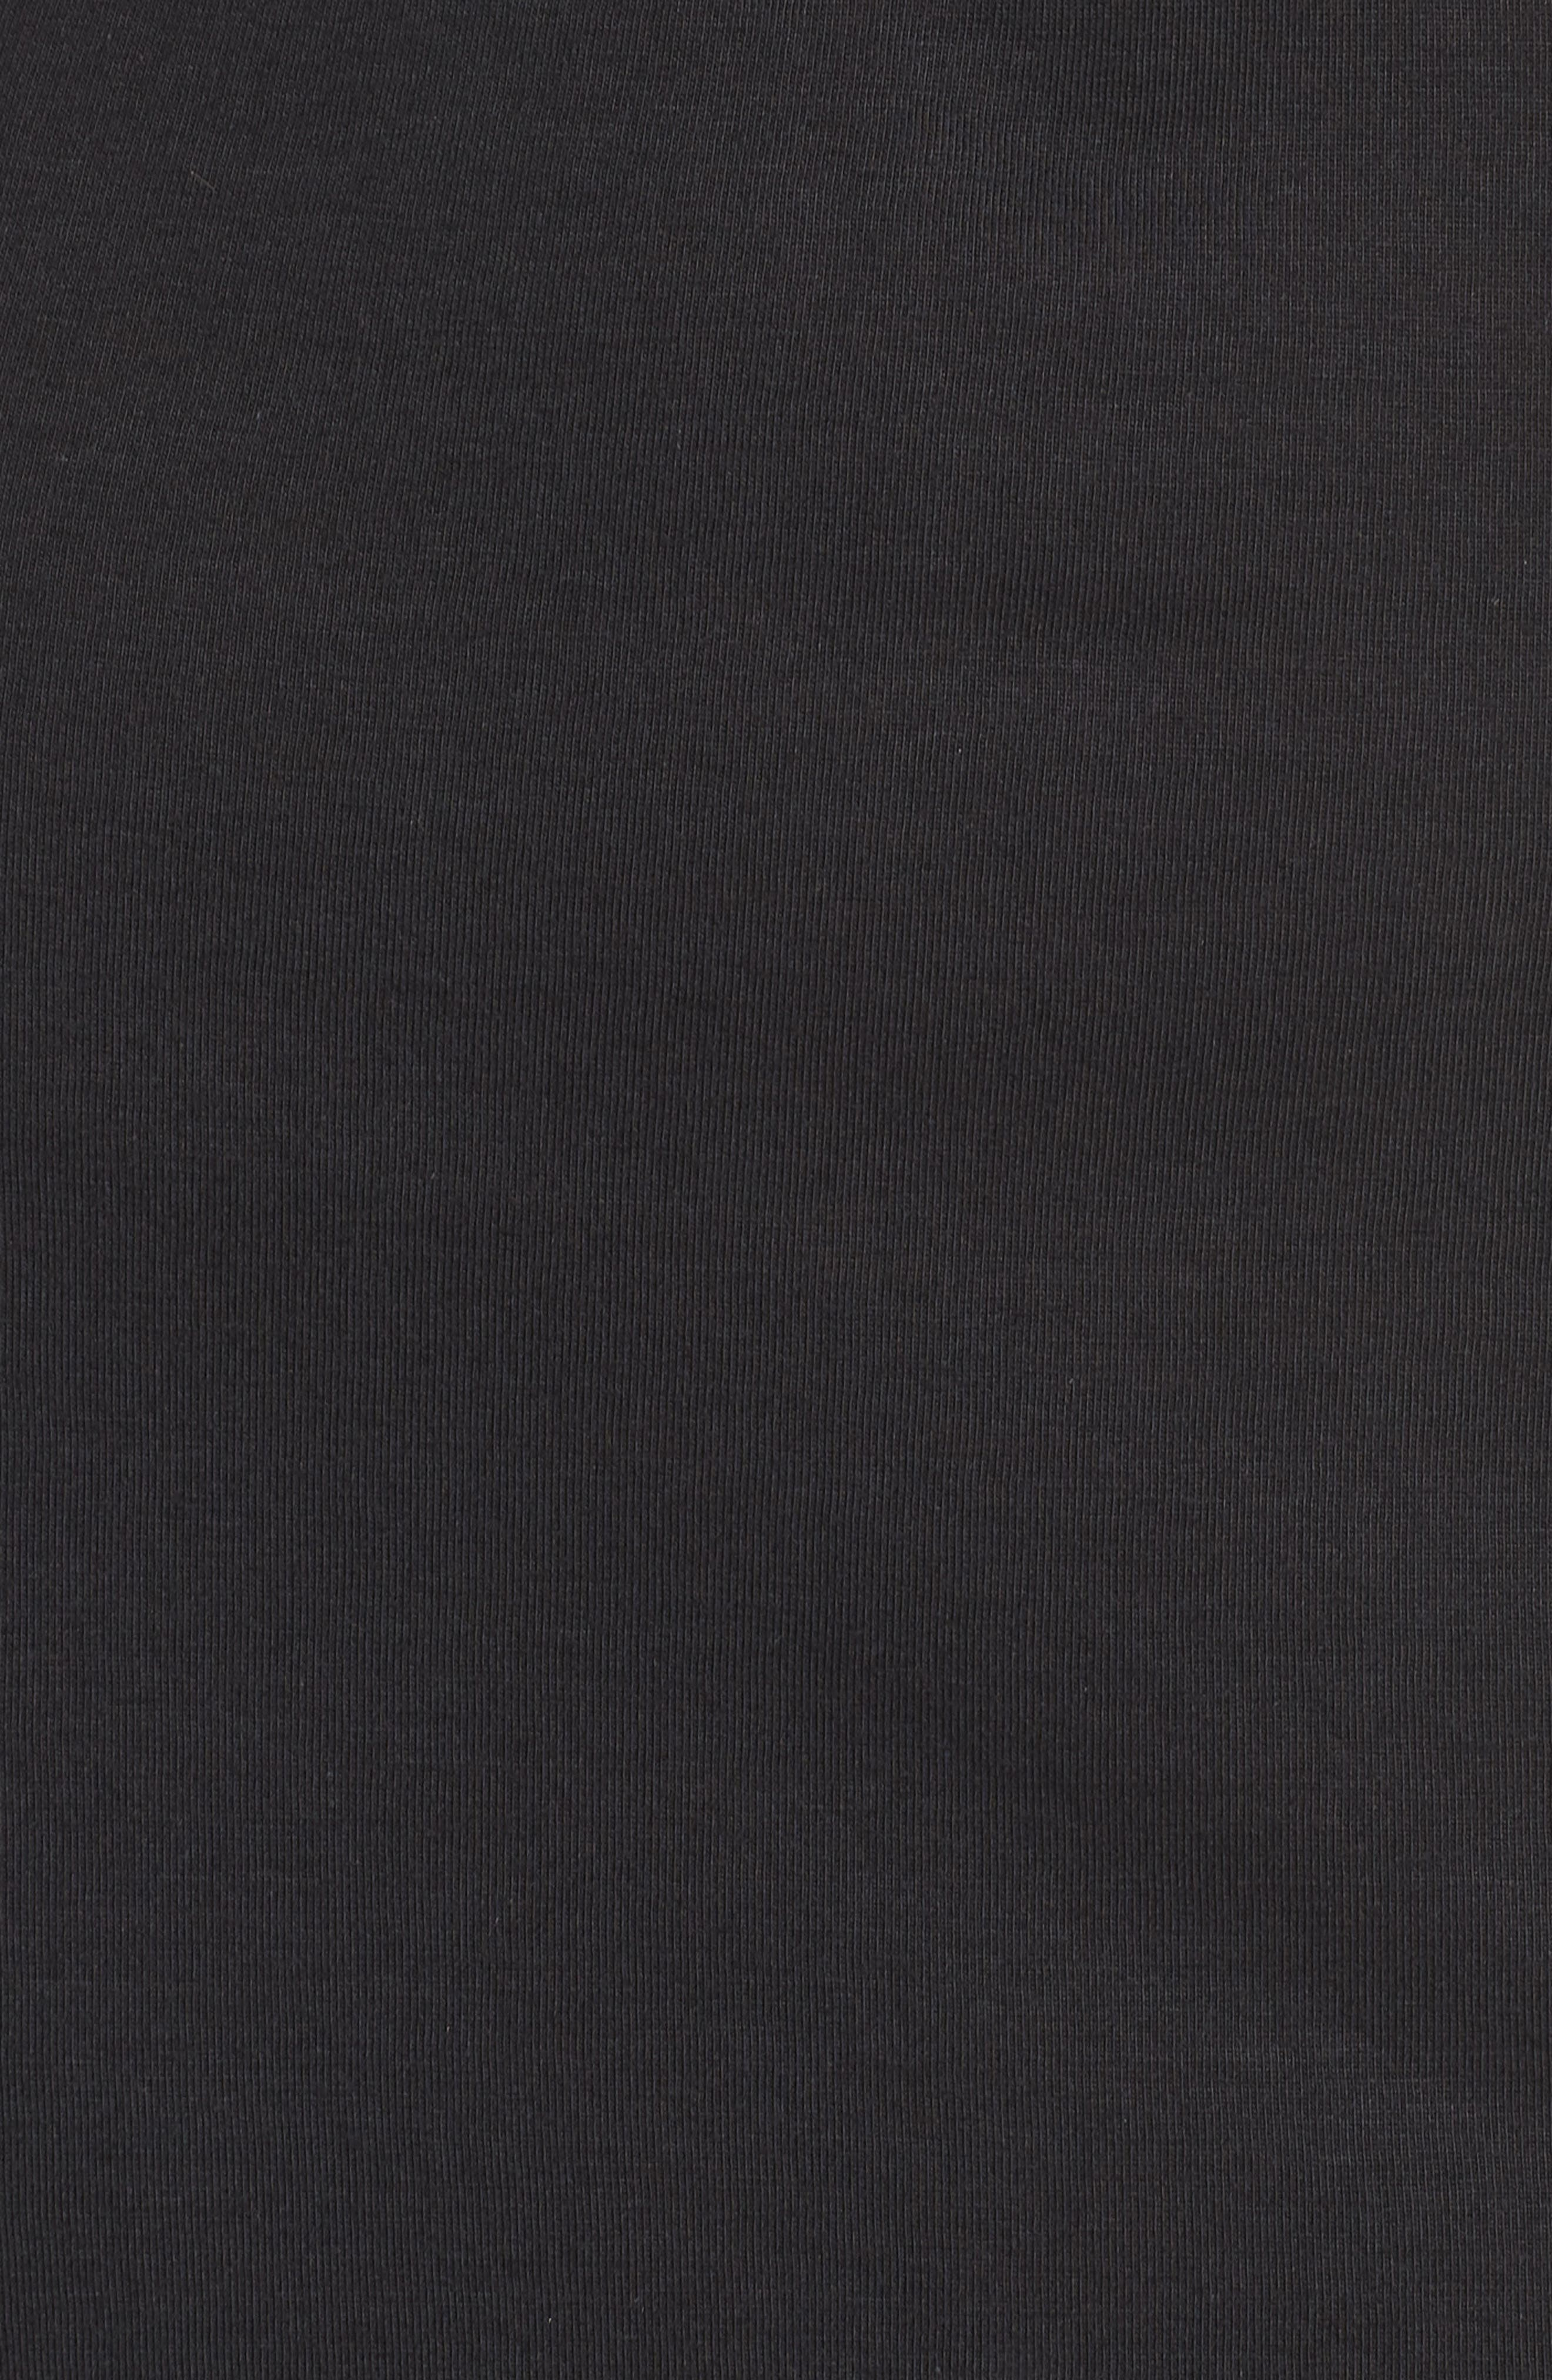 NATORI, Luxe Shangri-La Nightgown, Alternate thumbnail 5, color, BLACK